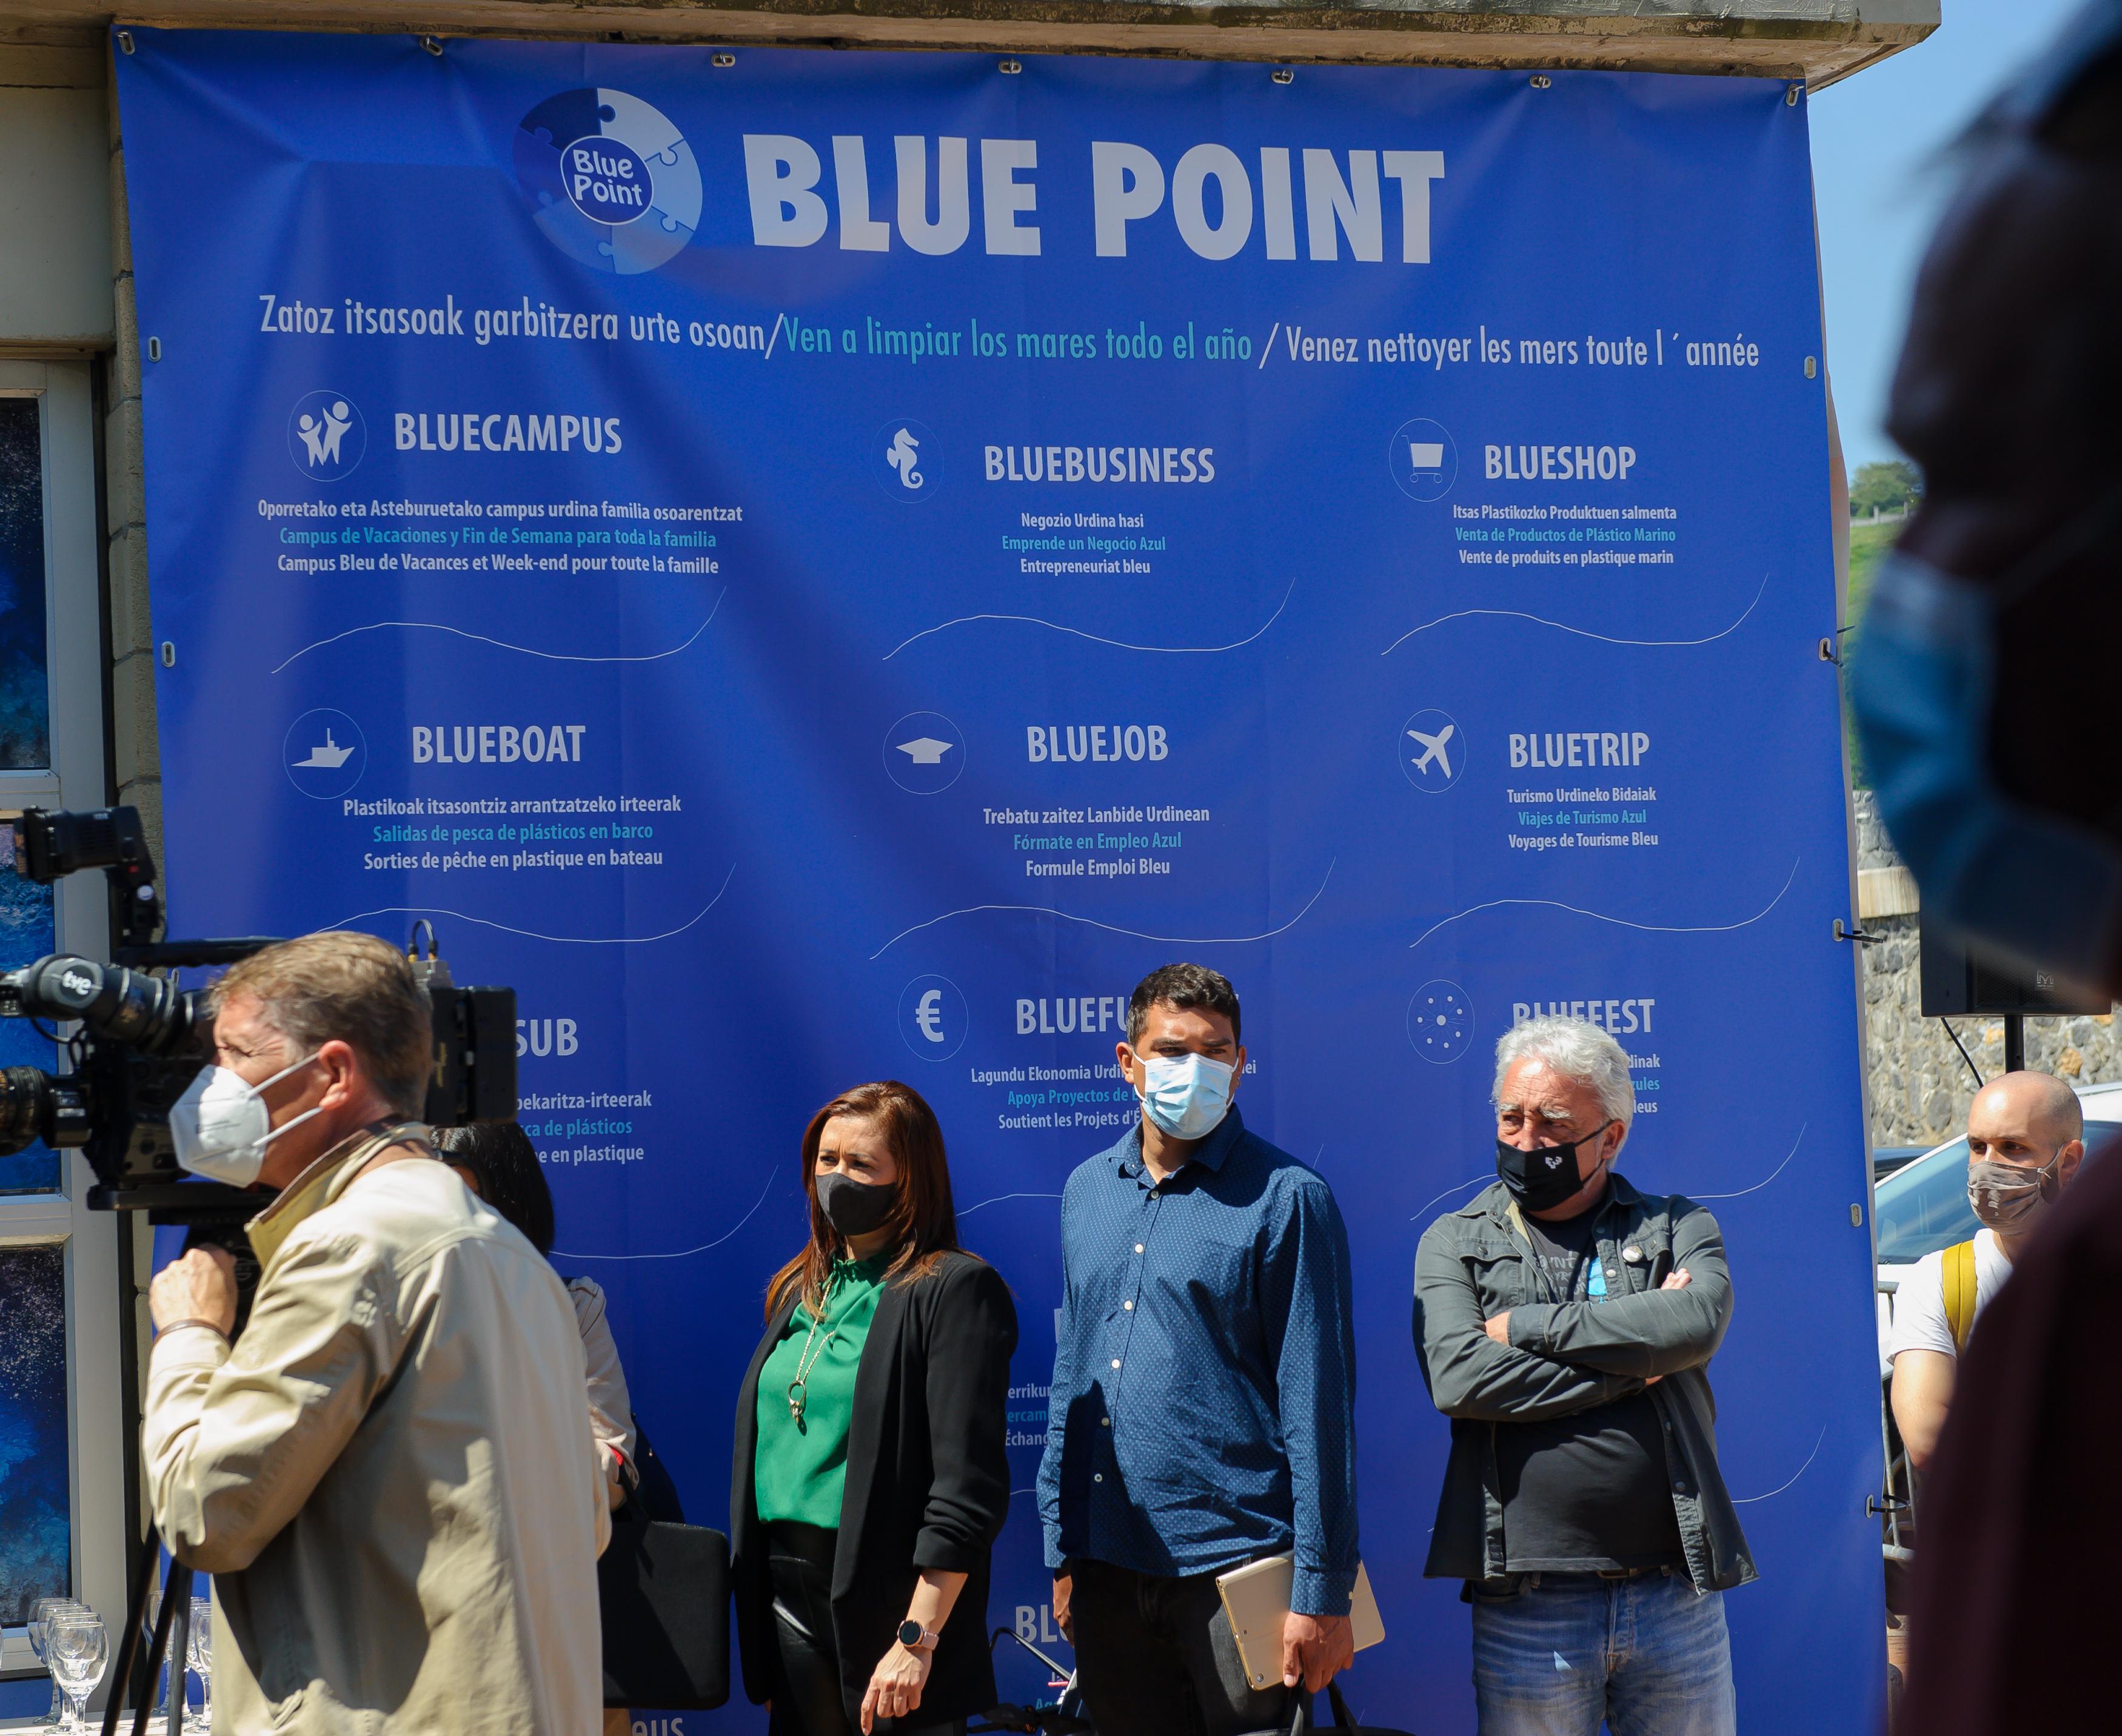 20210607-BARREDO-BLUE_POINT-119.jpg